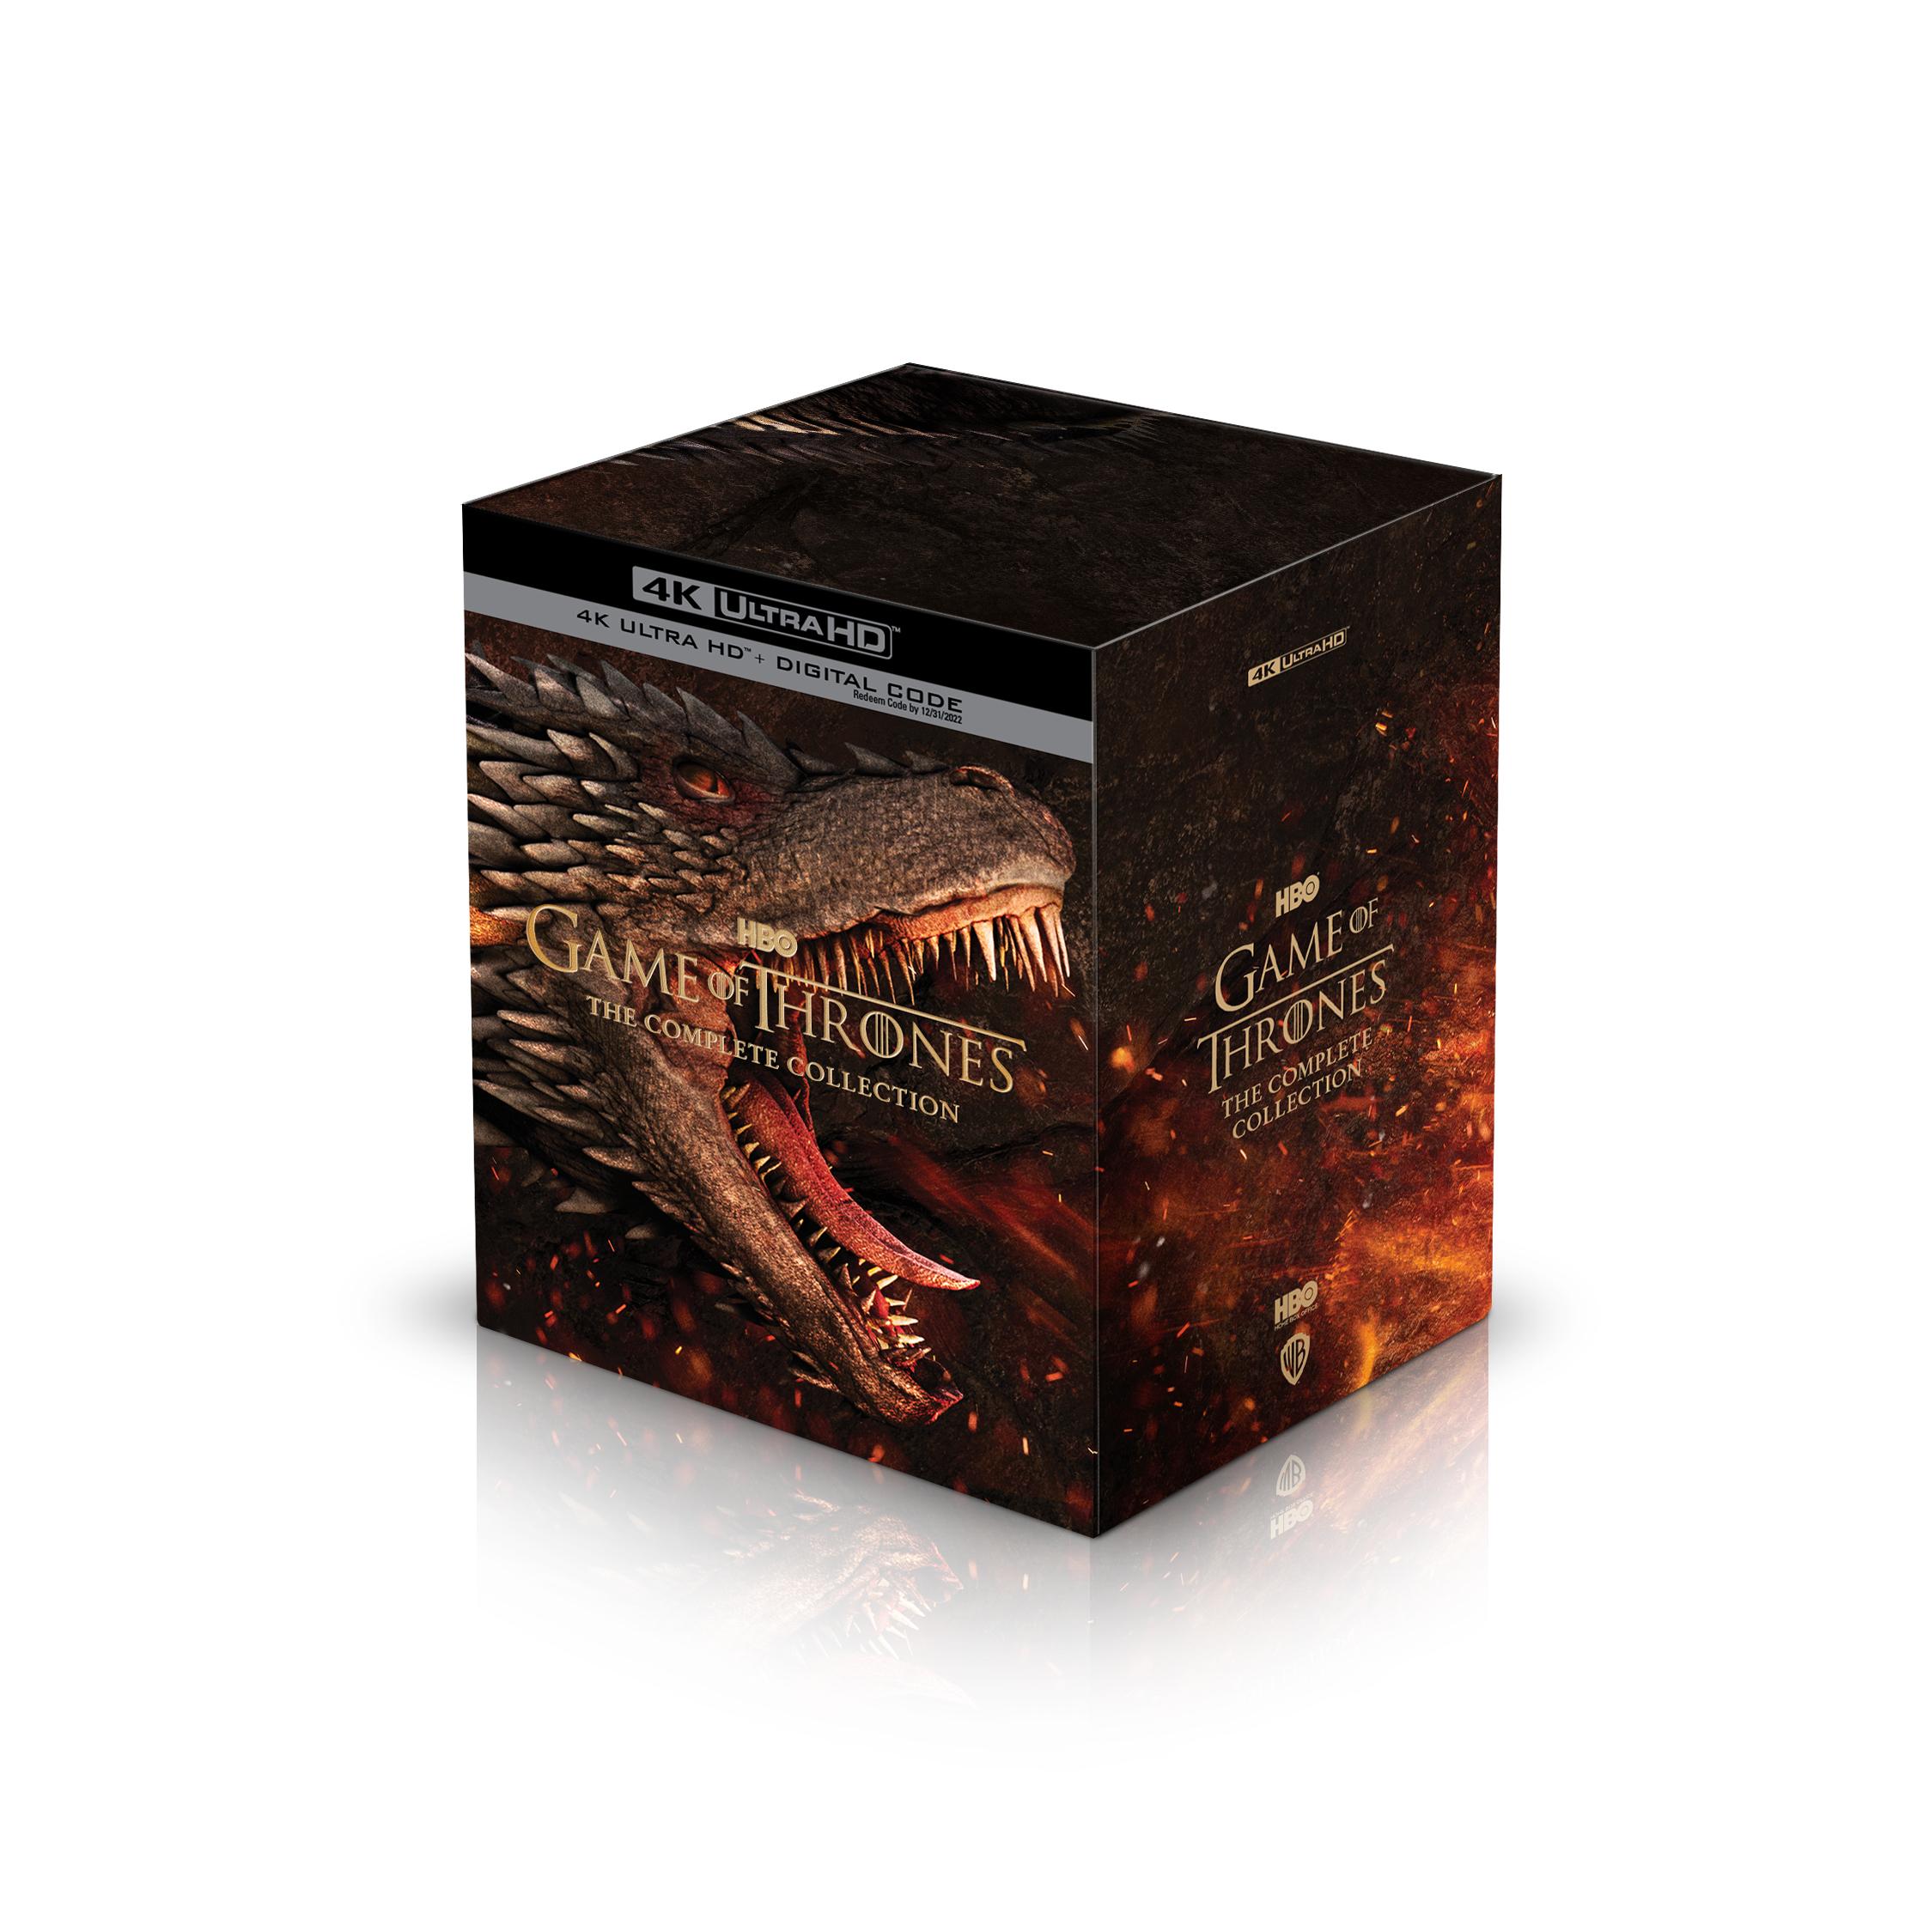 Game of thrones complete season 1 - 8 4K UHD Complete